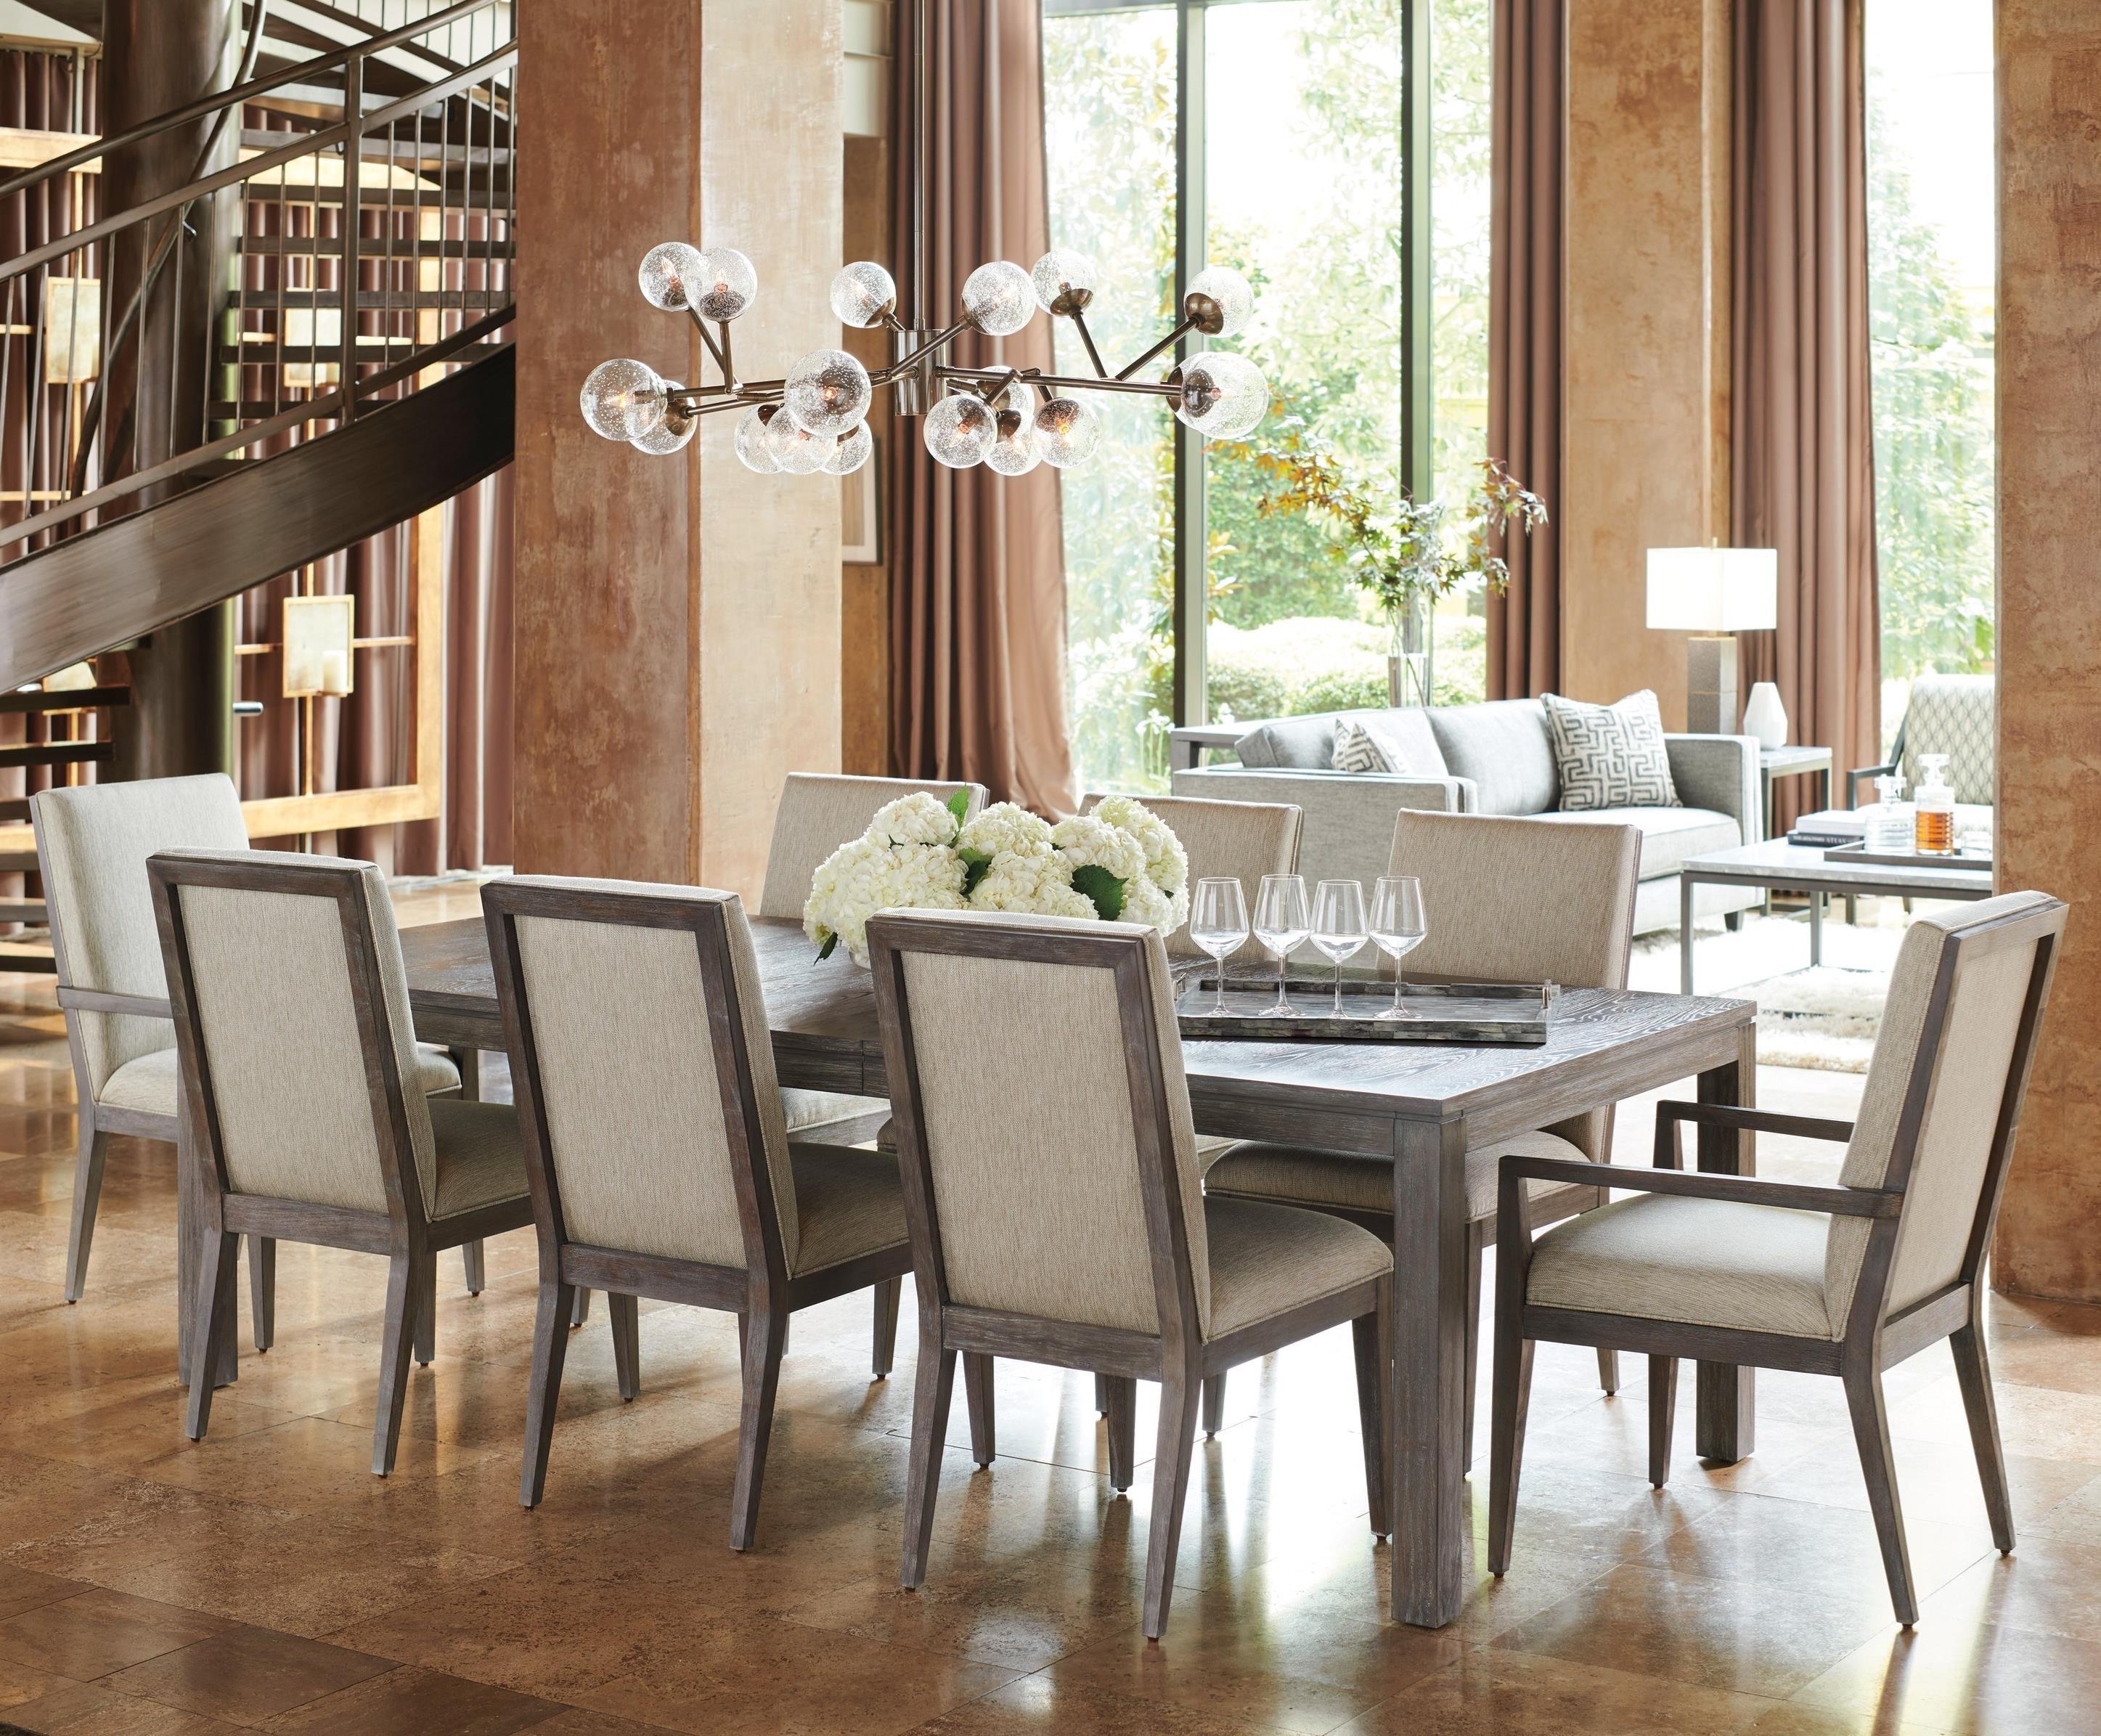 lexington dining chairs recording studio chair santana nine piece set with marin table hudson s santana9 pc